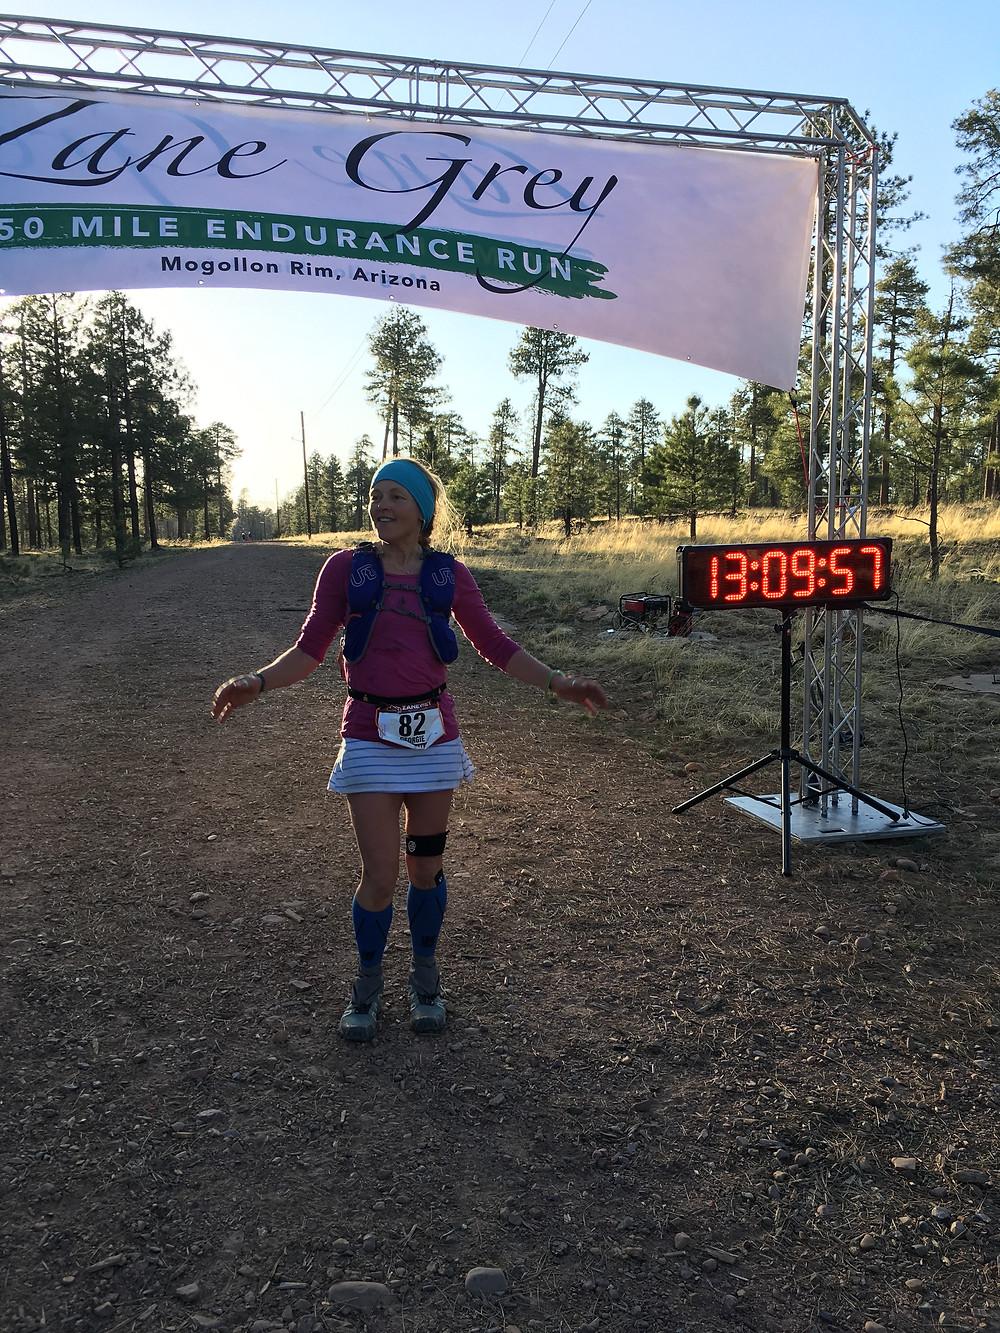 Finish line Zane Grey 50 miler, Tonga National Park, Arizona.